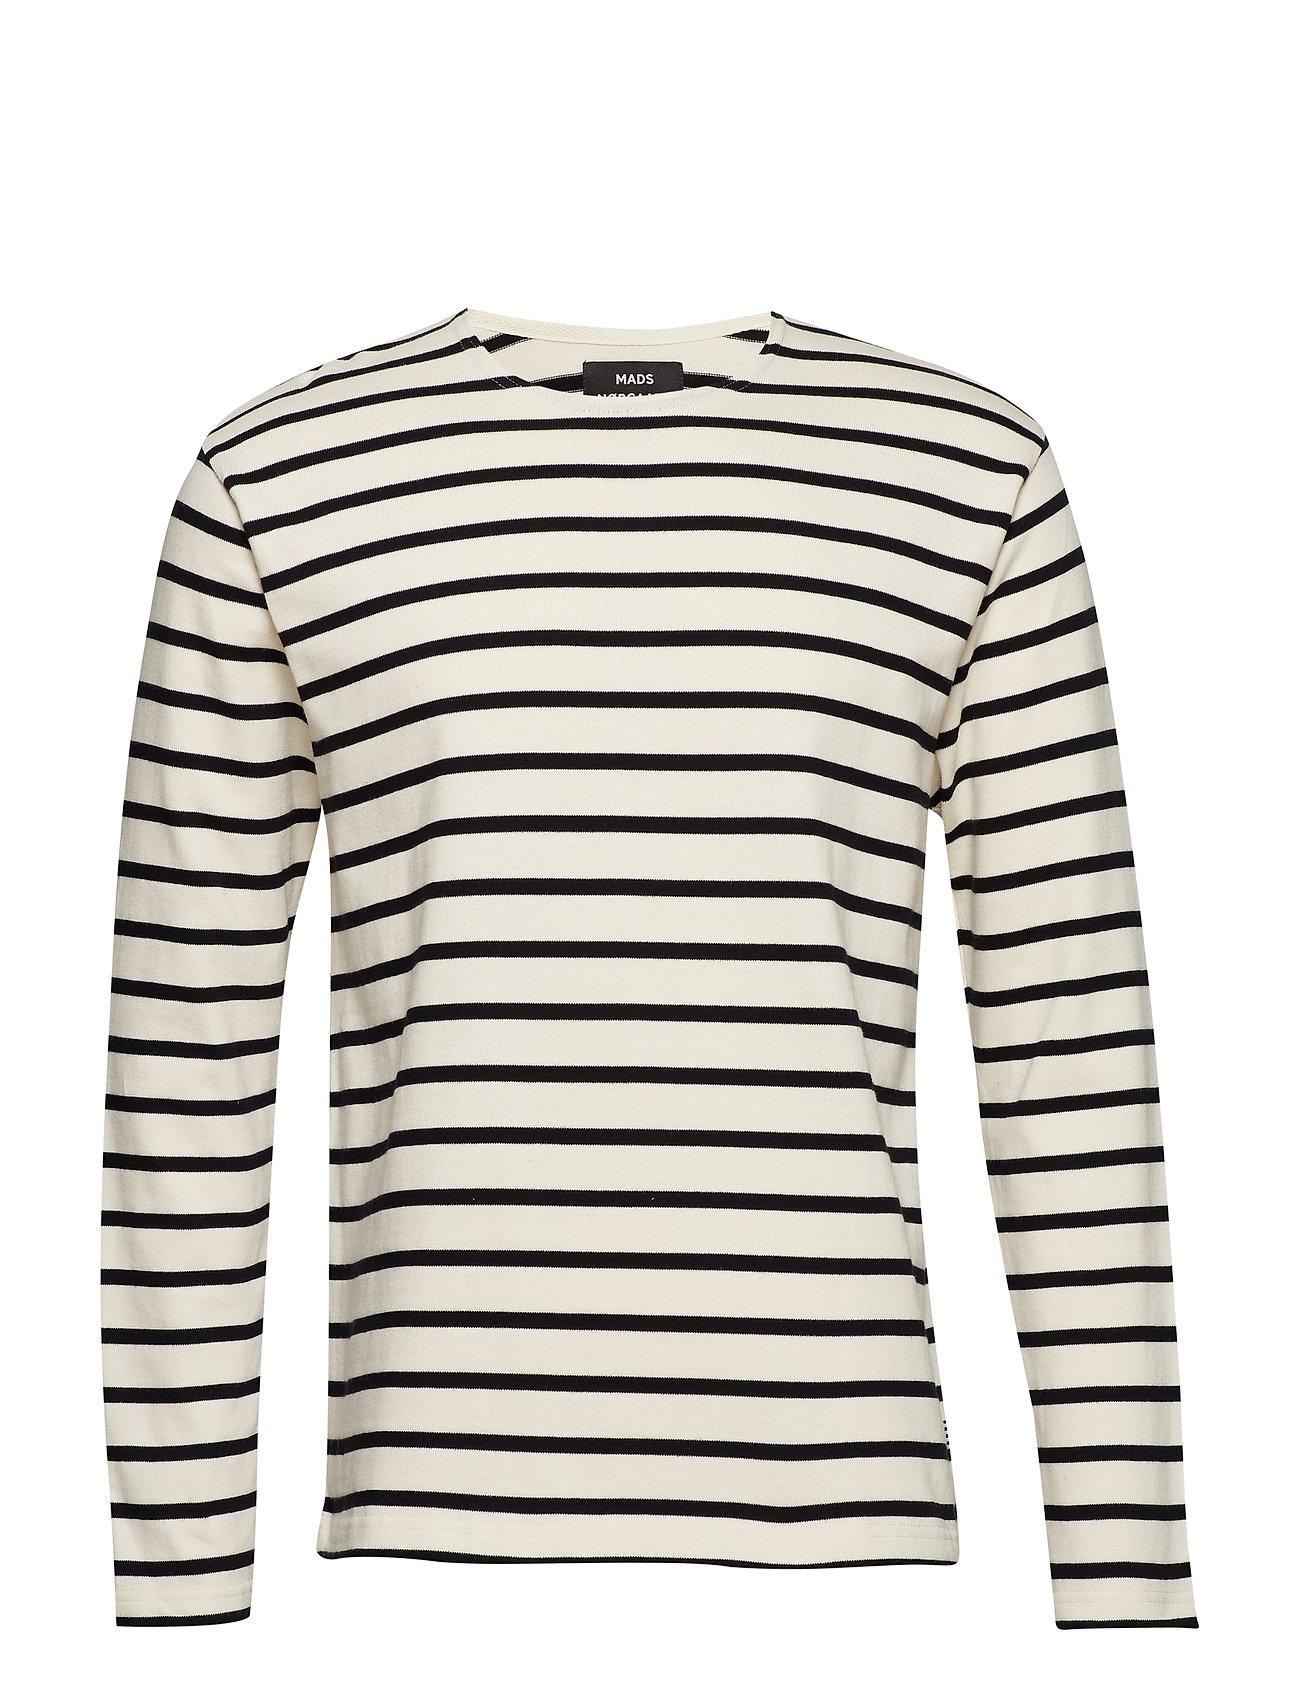 58ed1aa8e6e WHITE ALYSSUM/BLACK Mads Nørgaard Picasso Tash Long langærmede t ...